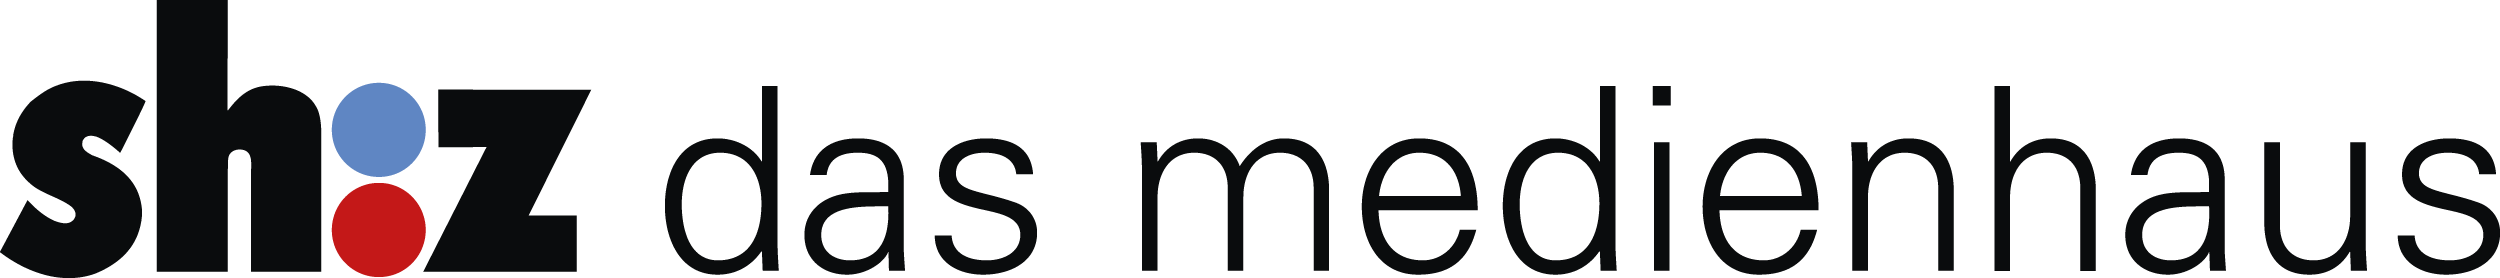 SHZ_das_medienhaus_Logo_RGB_2500pxbreite